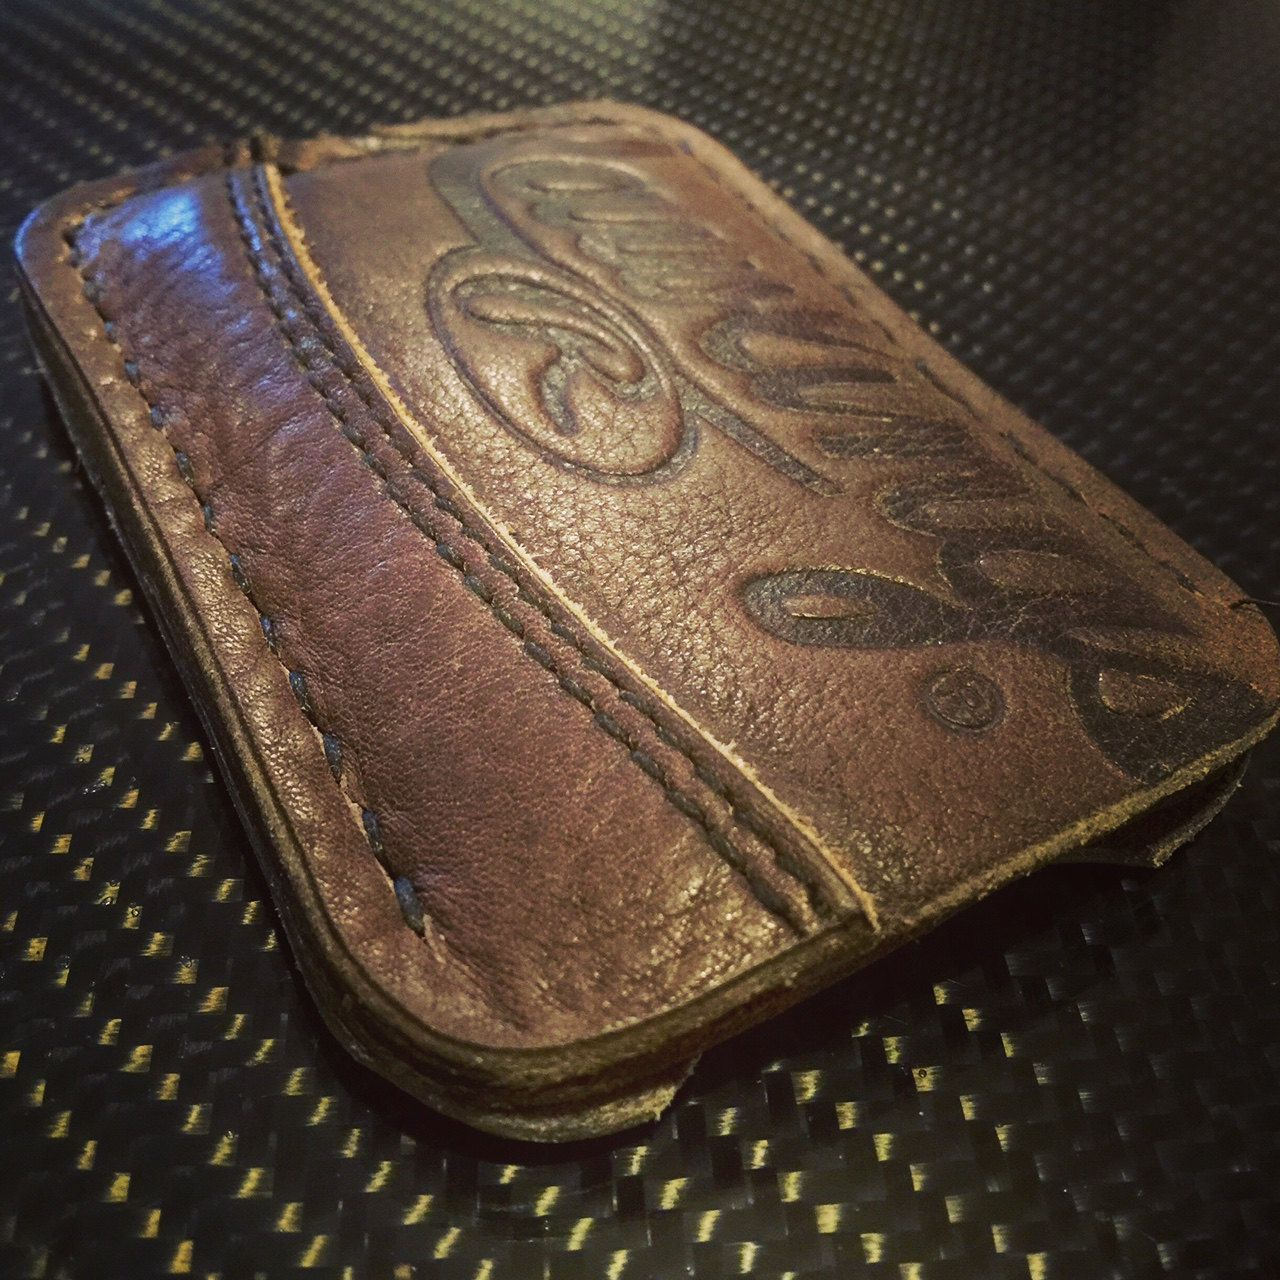 Recycled baseball glove wallet - Minimalist Leather 2 Pocket Wallet Made From Rawlings Baseball Mitt